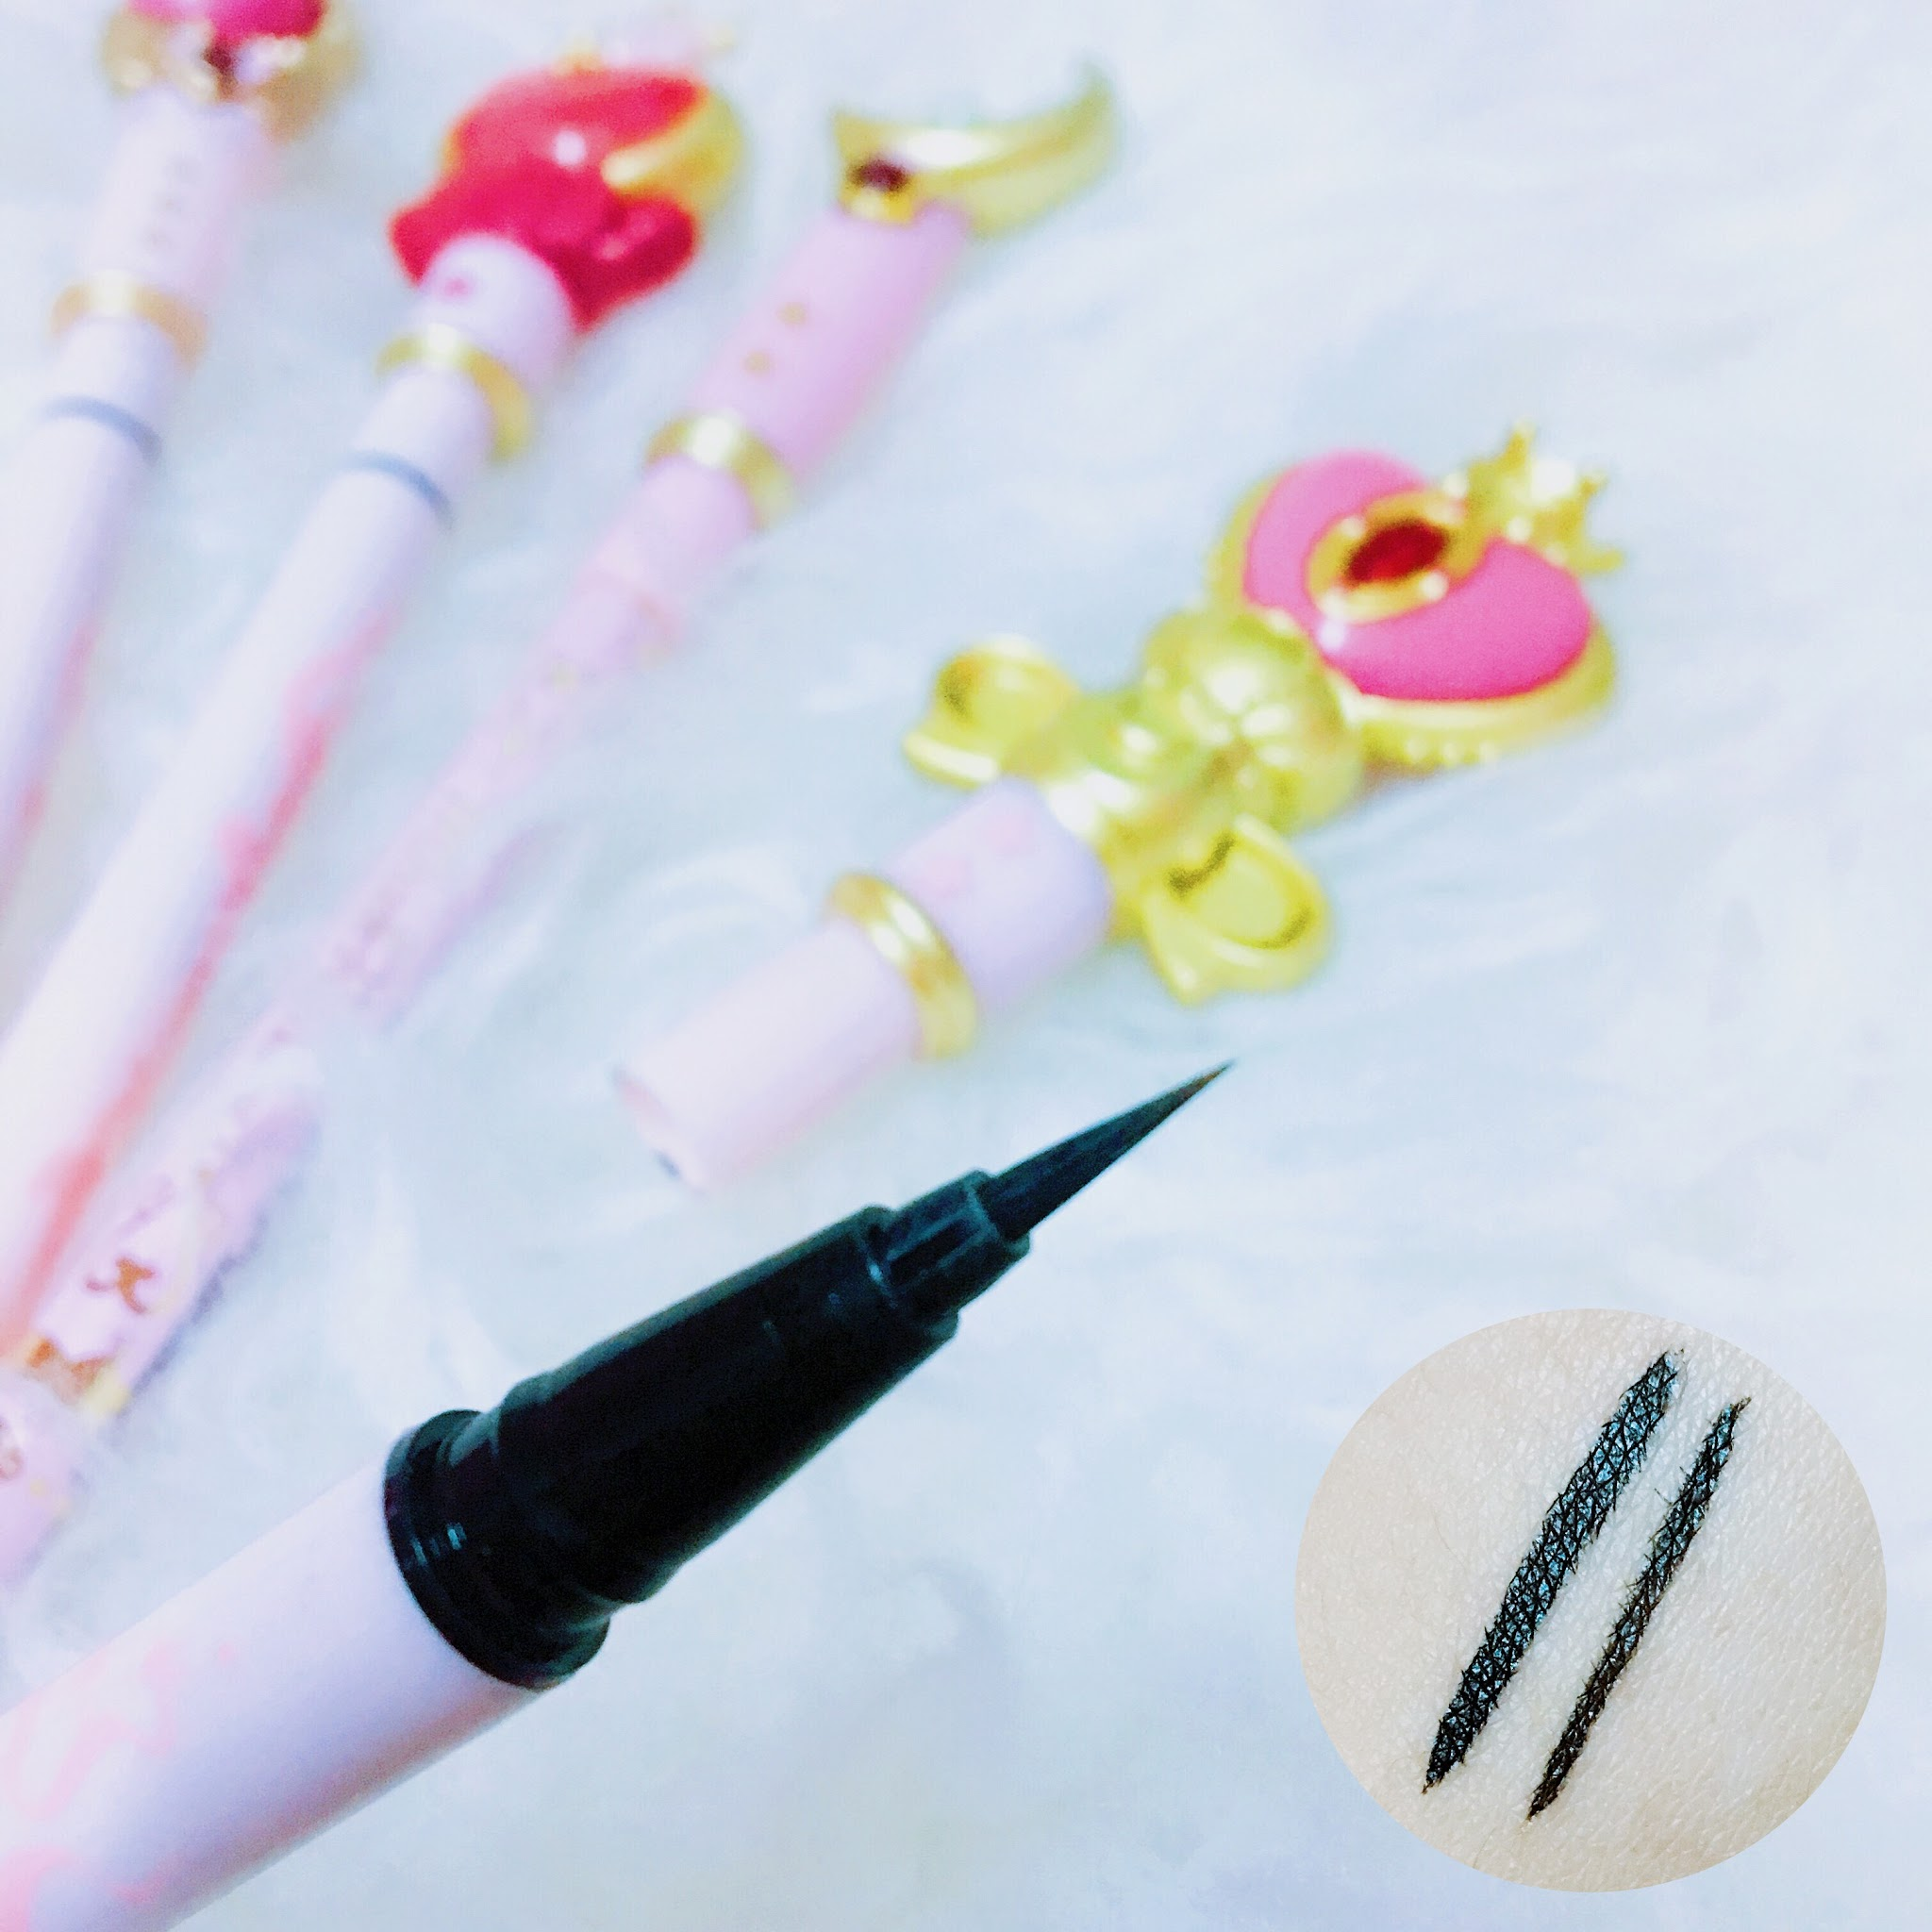 Sailormoon Miracle Romance Eyeliners; Sailormoon Miracle Romance Liquid Eyelibers; Miracle Romance Sailormoon Eyeliner Review